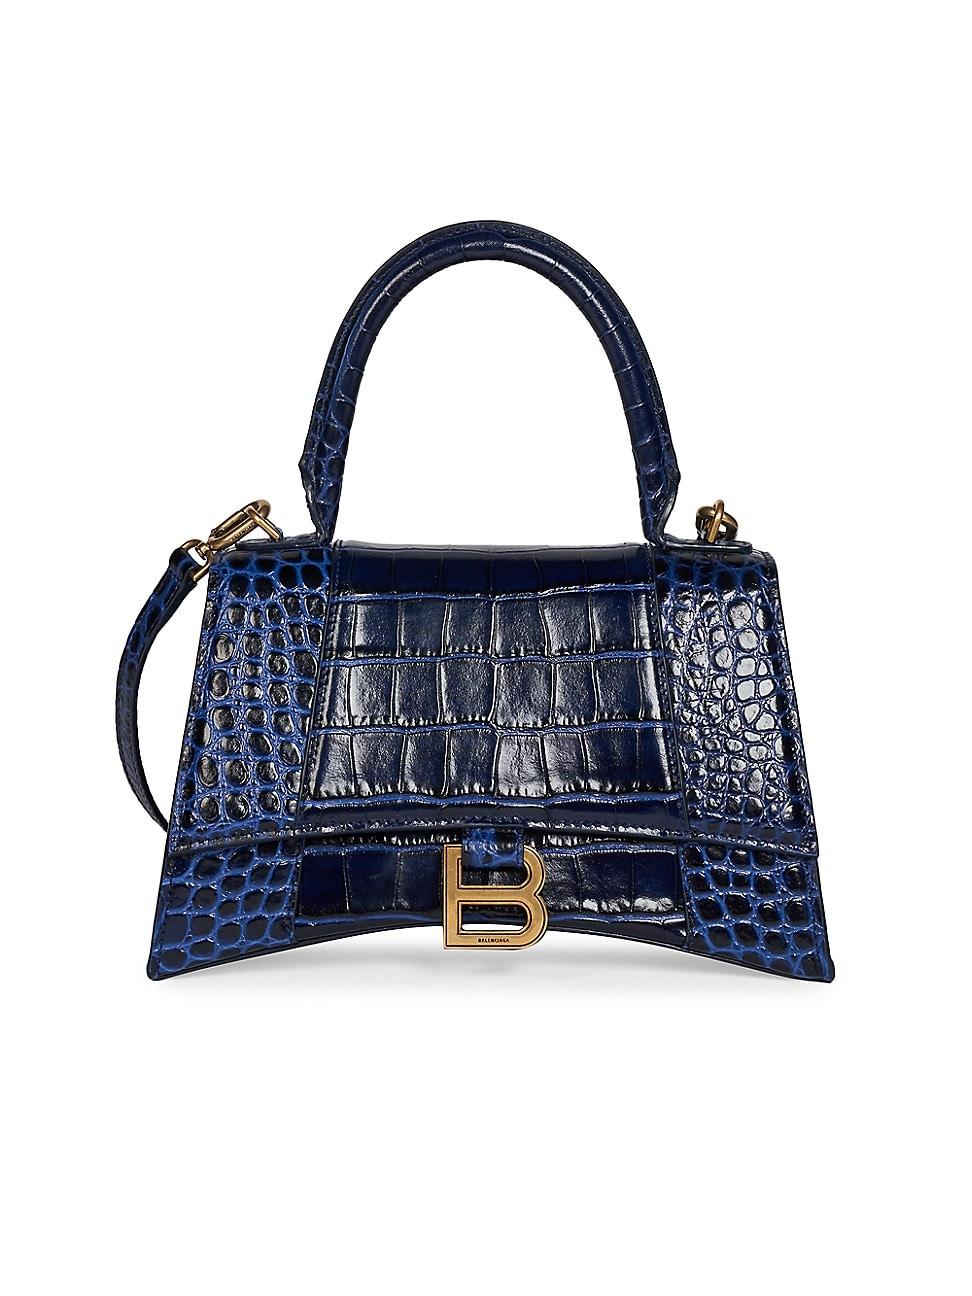 Balenciaga WOMEN'S HOURGLASS LEATHER TOP HANDLE BAG - NAVY